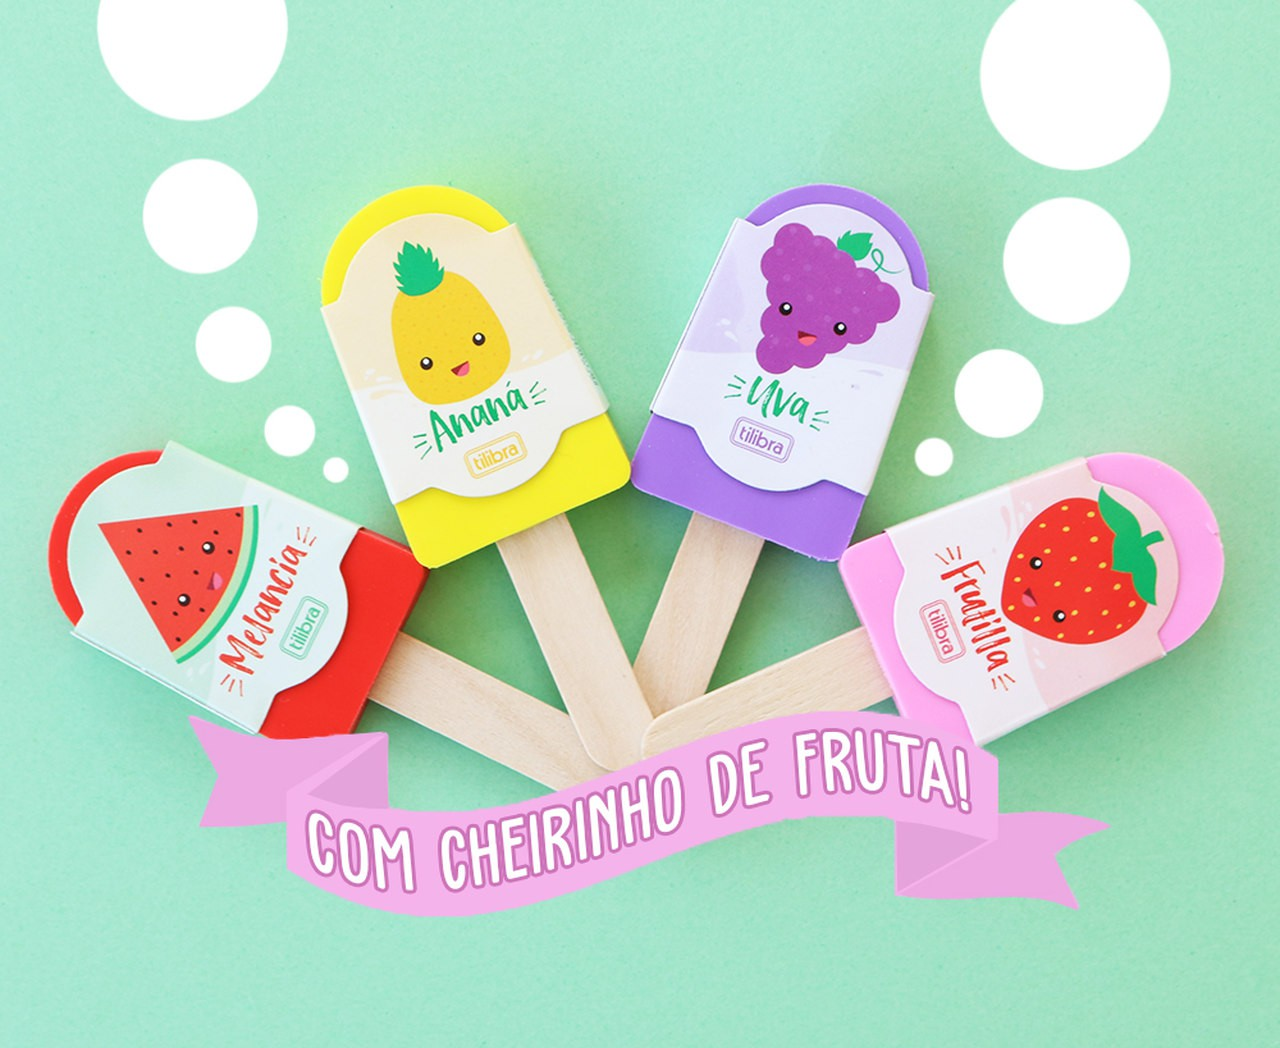 Borracha Picóle com Cheiro (Escolha a cor)